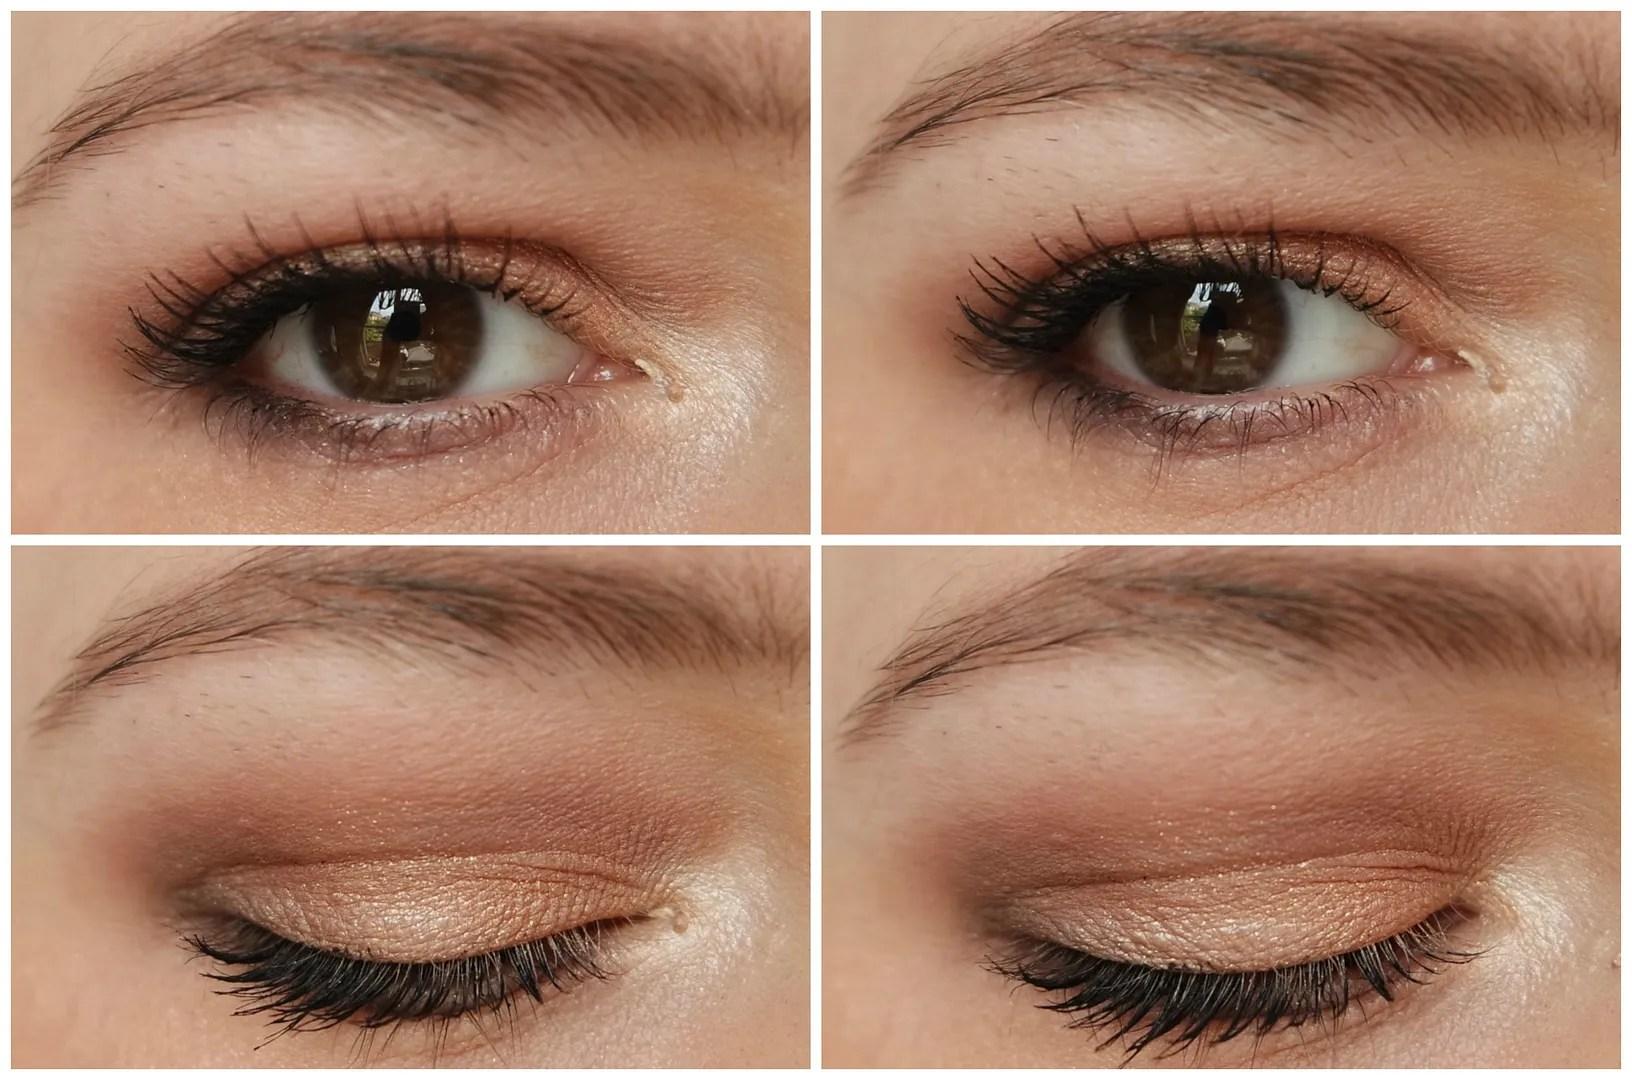 MAC Single eye shadows Honey Lust, Corduroy, Embark, Beauty Marked